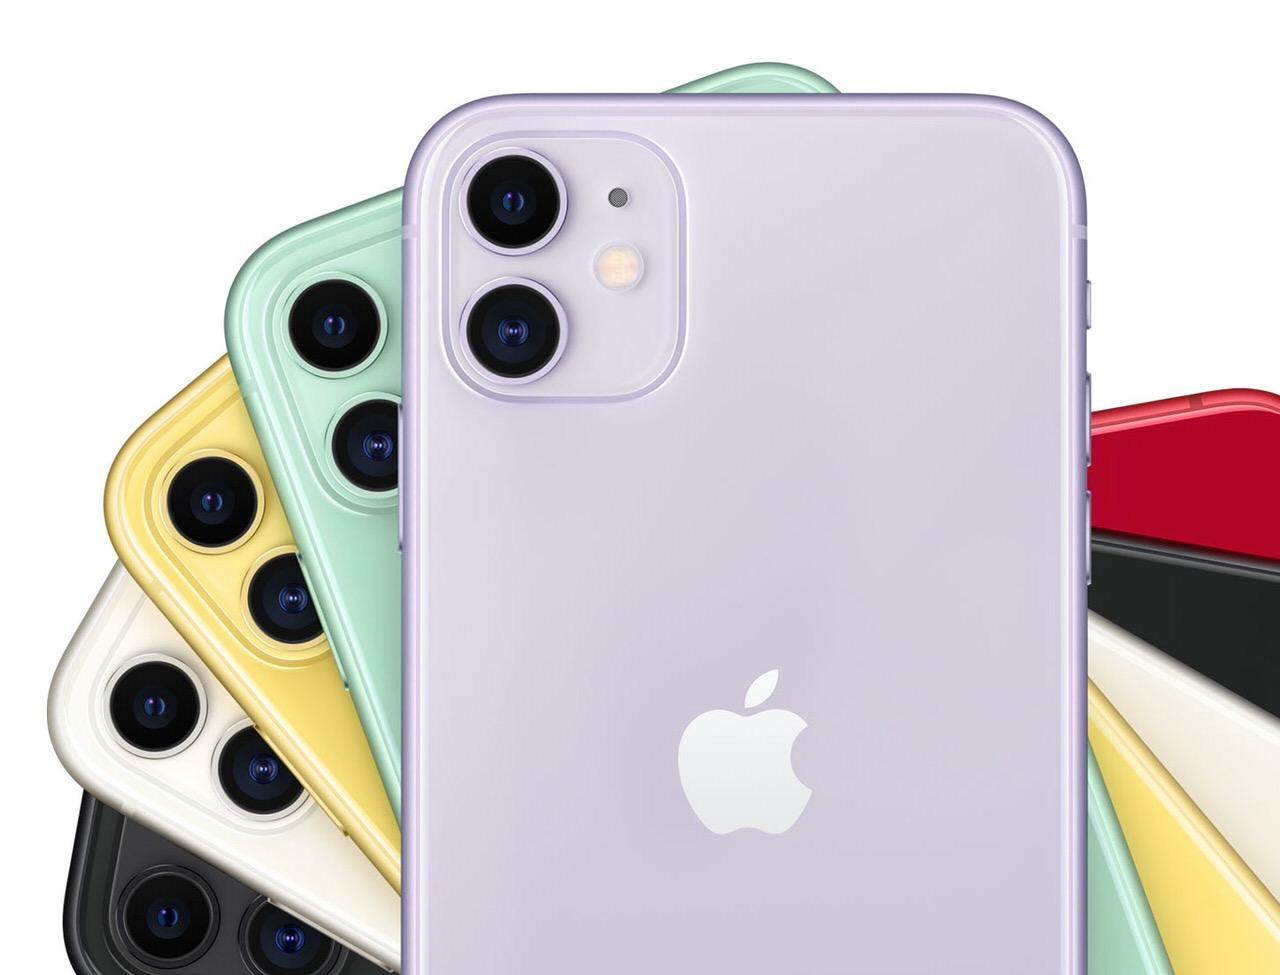 「iPhone 11」「iPhone 11 Pro」メインメモリーは4GB